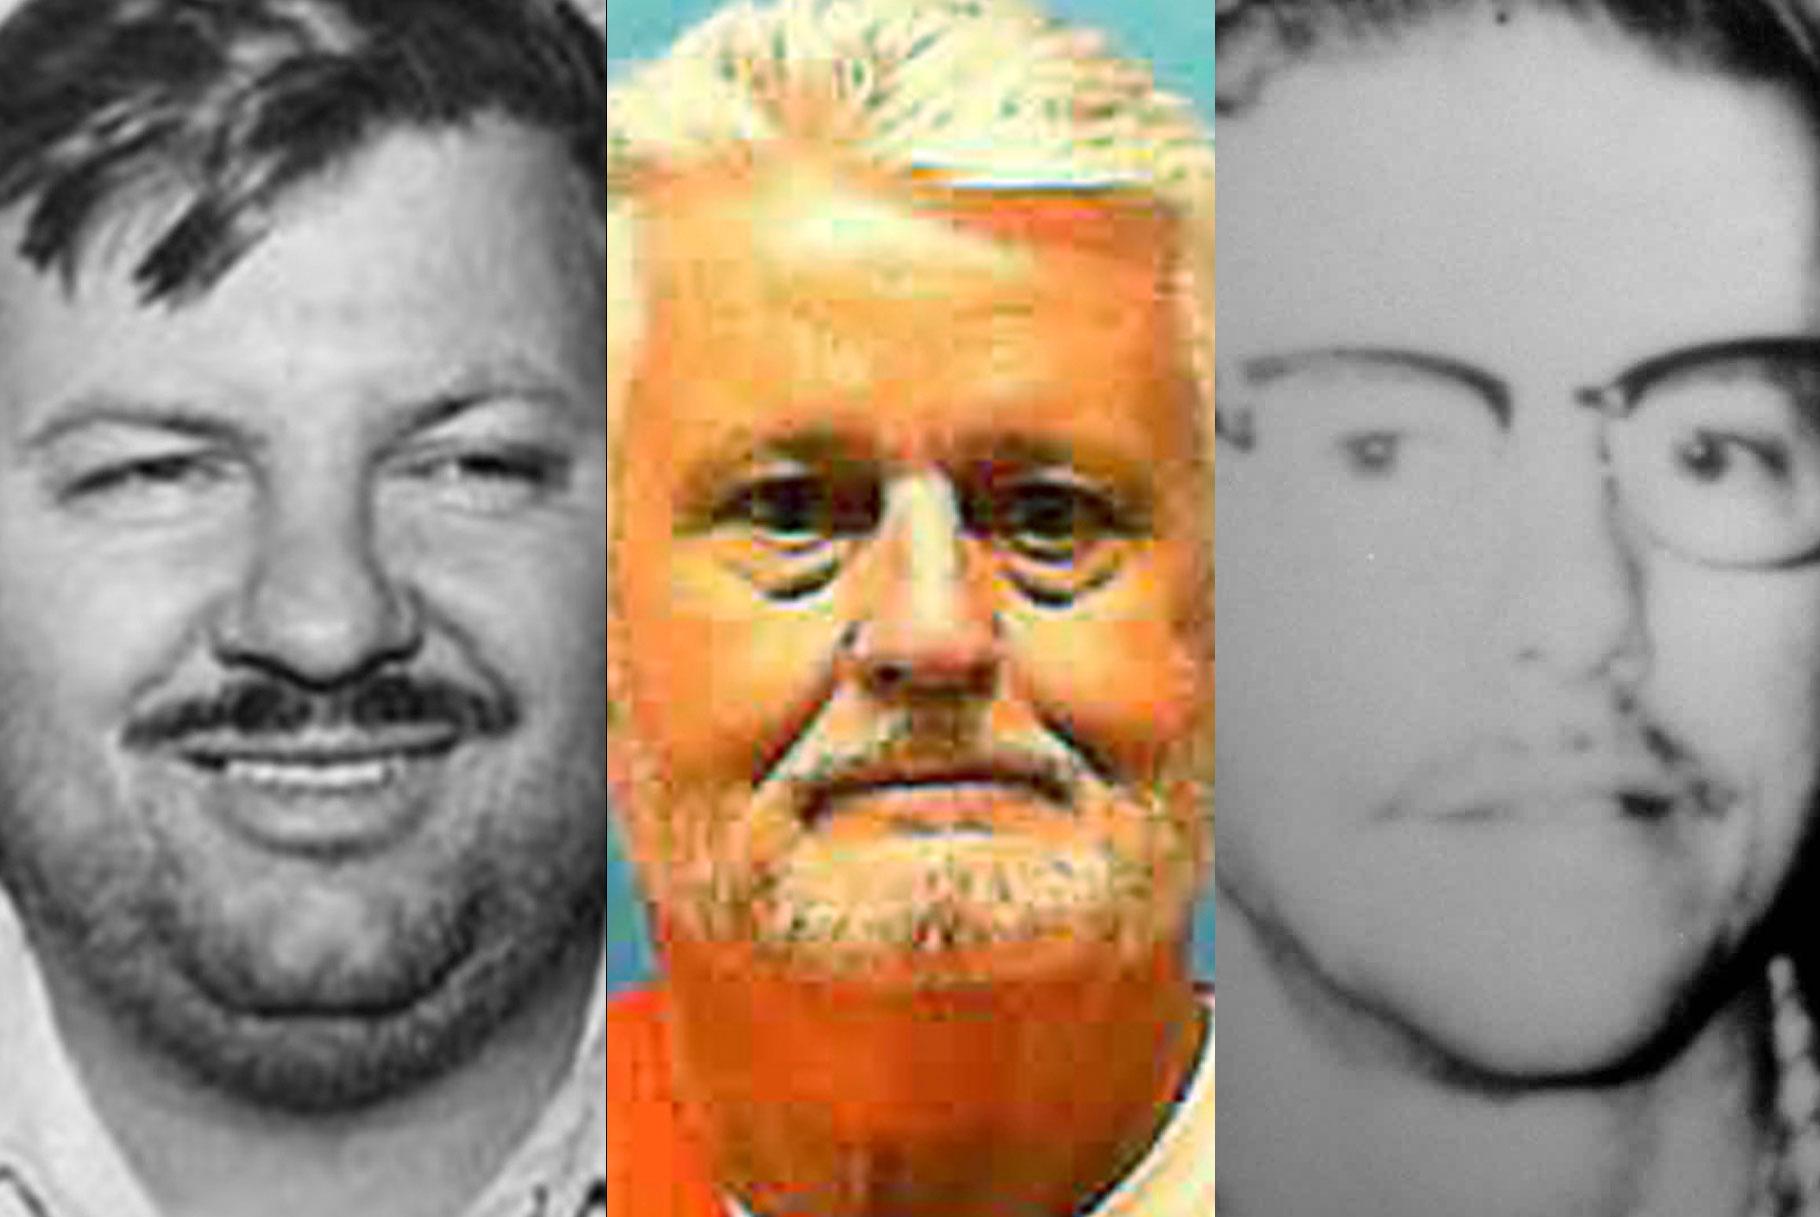 Binge The 'Mark Of A Serial Killer' Μαραθώνιος αυτό το Σαββατοκύριακο στο Oxygen